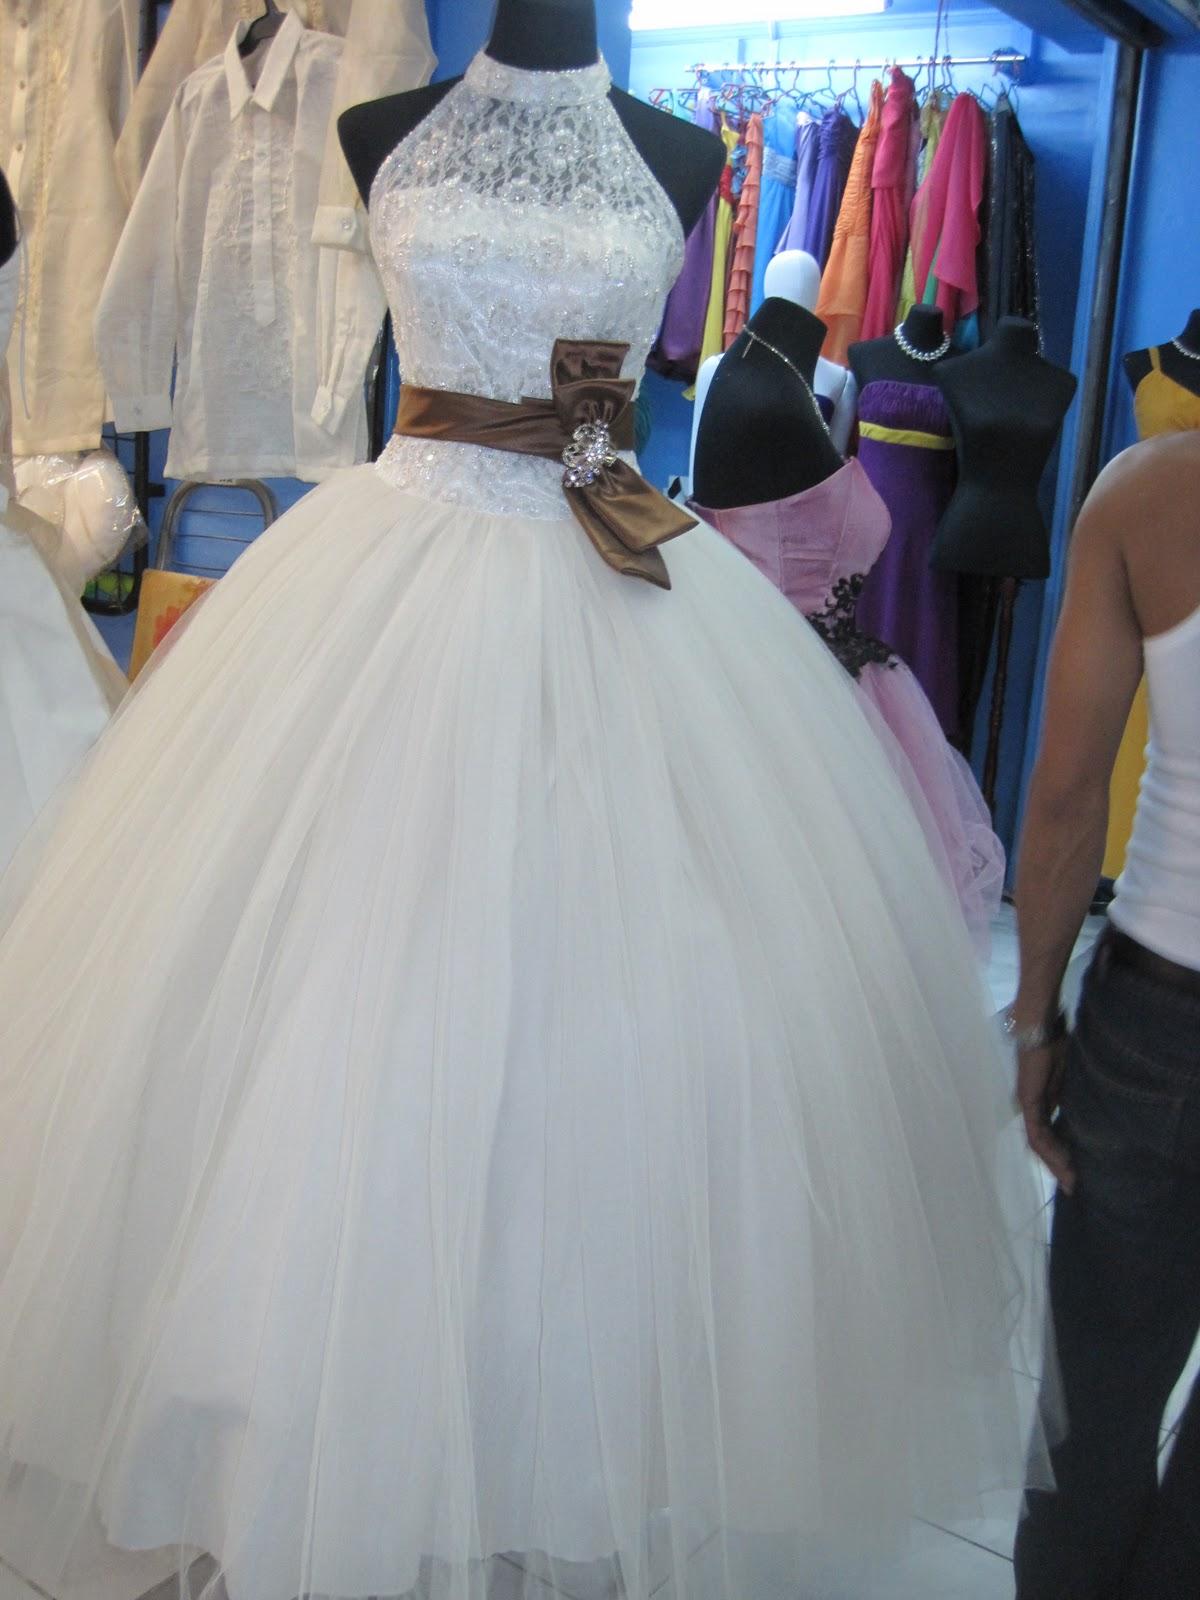 wedding dresses for sale philippines wedding dresses for sale Wedding Dresses For Sale Philippines